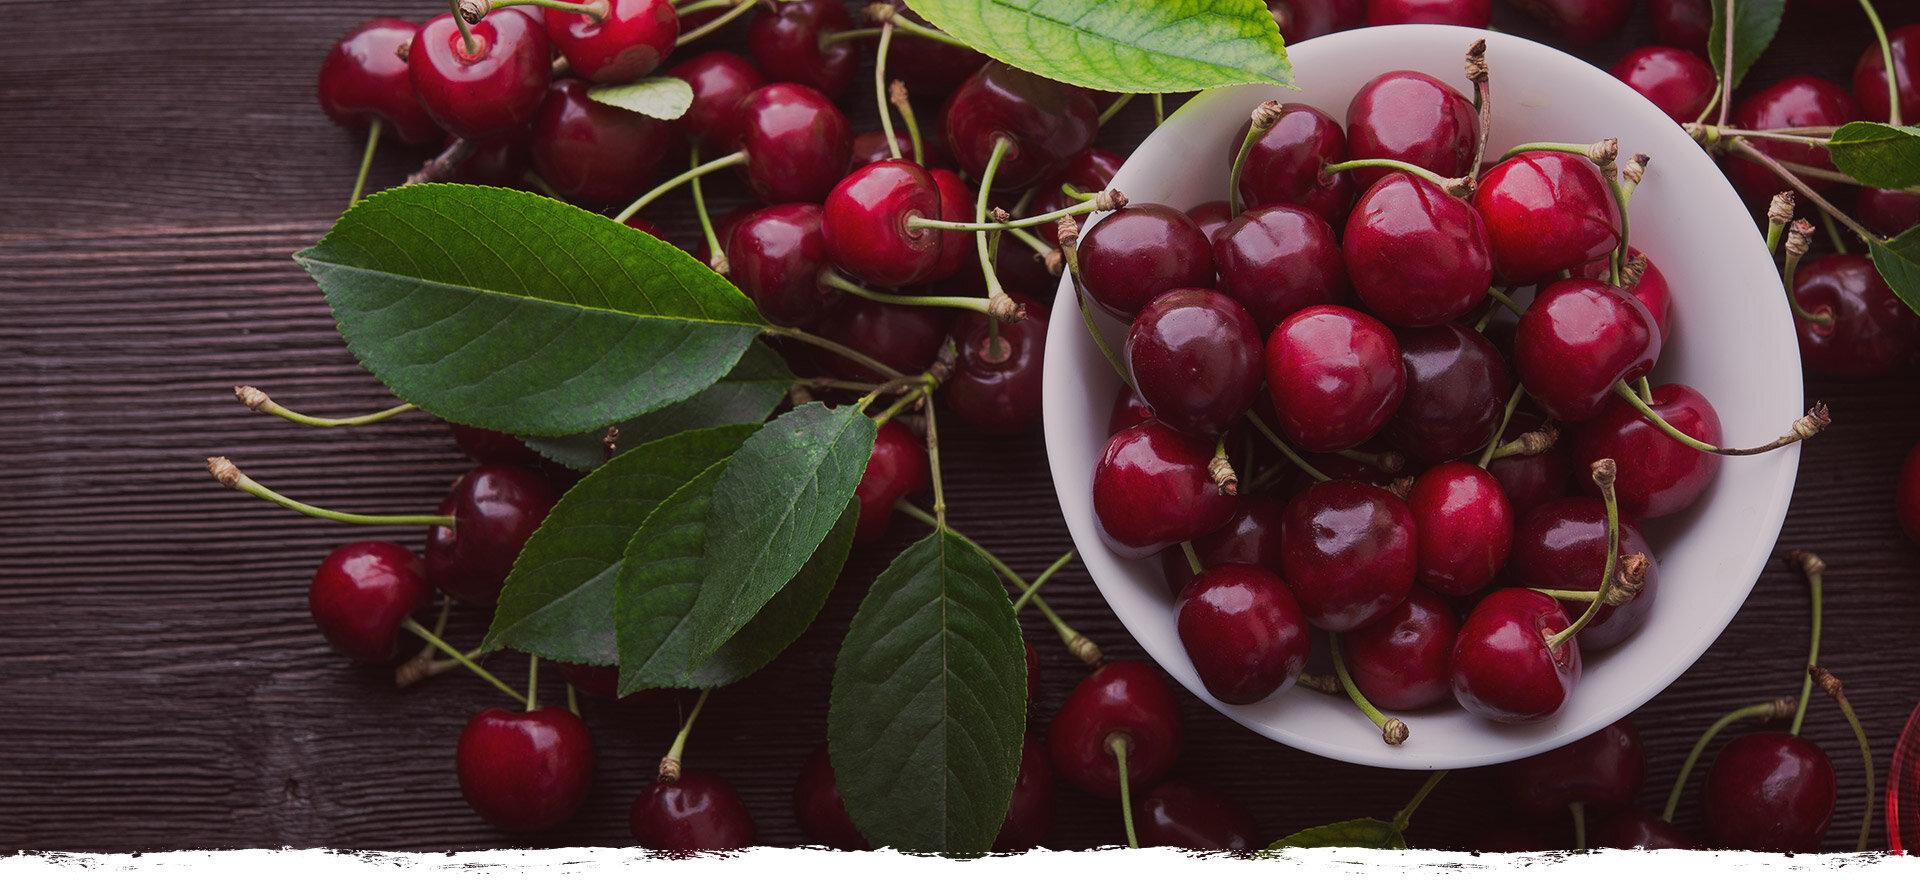 Cherry New Zealand bao nhiêu 1 kg